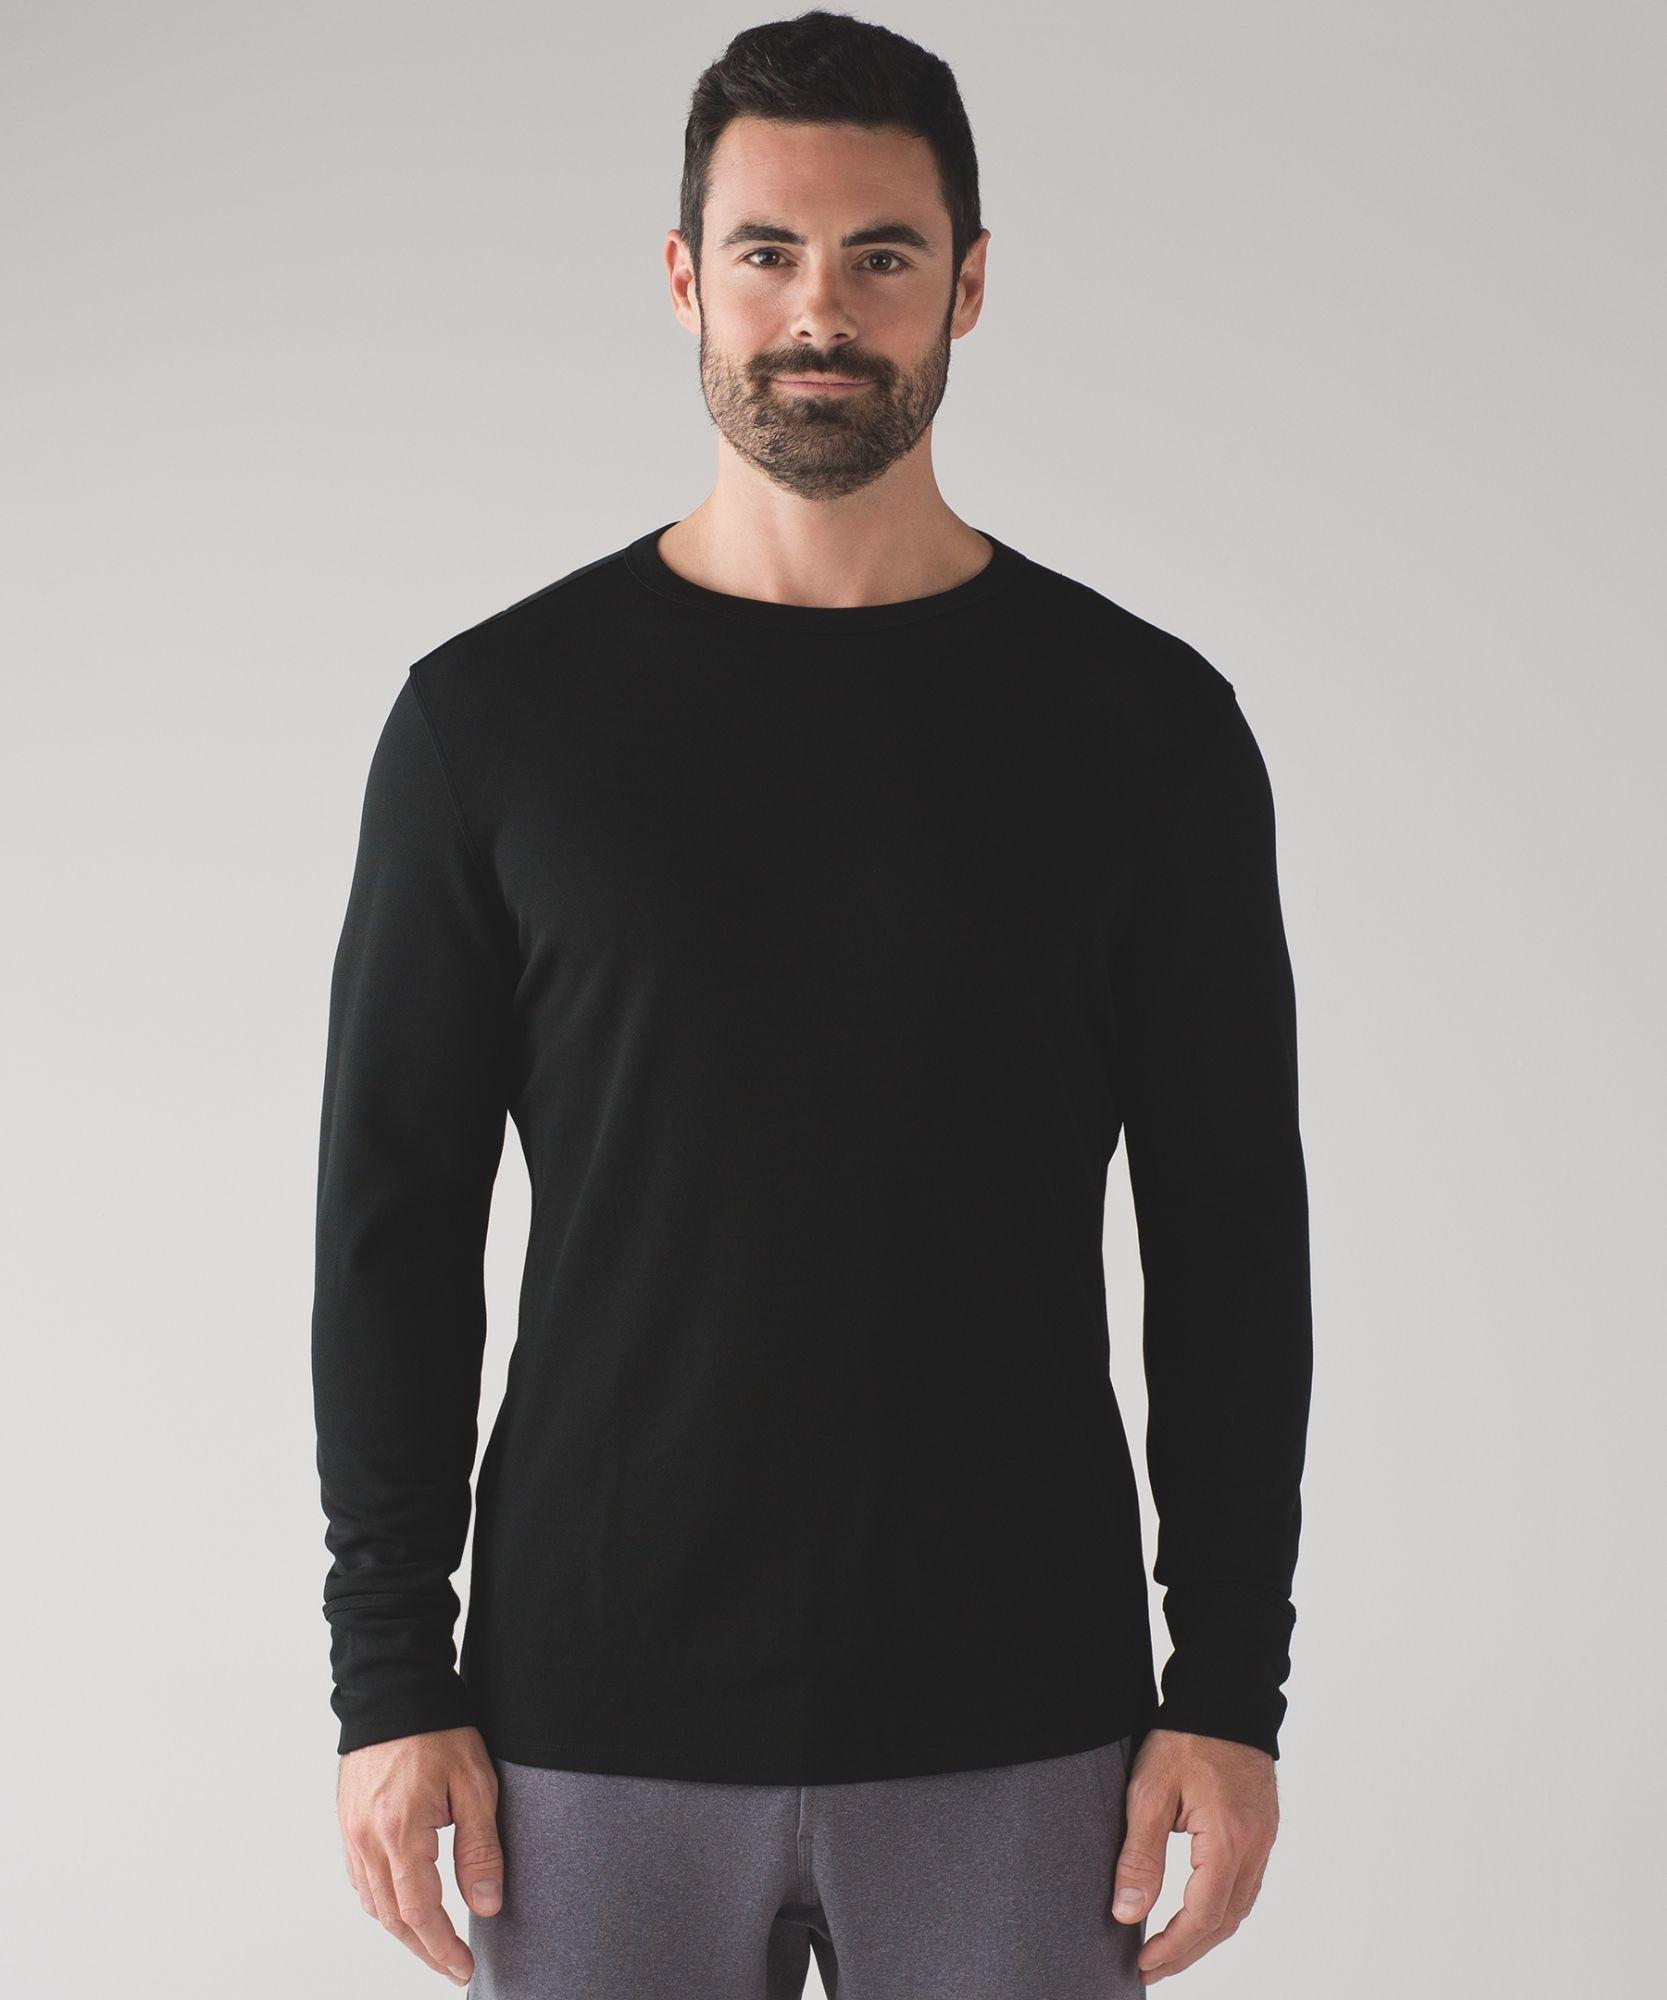 cbd768c318c7 Men's Long Sleeve - (Black, Size M) - Long Weekend Long Sleeve ...